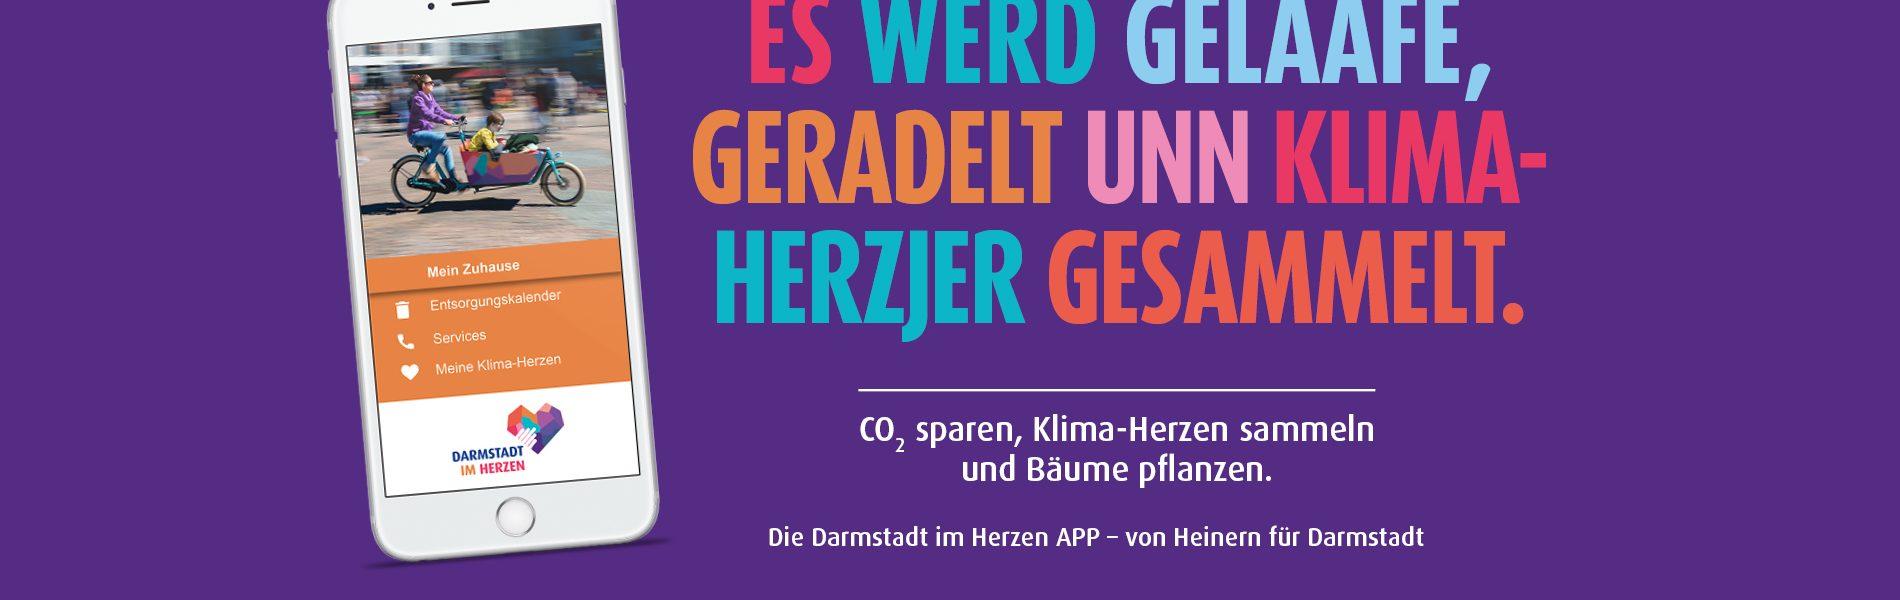 Header Bild Klimaherzen in der Darmstadt im Herzen APP